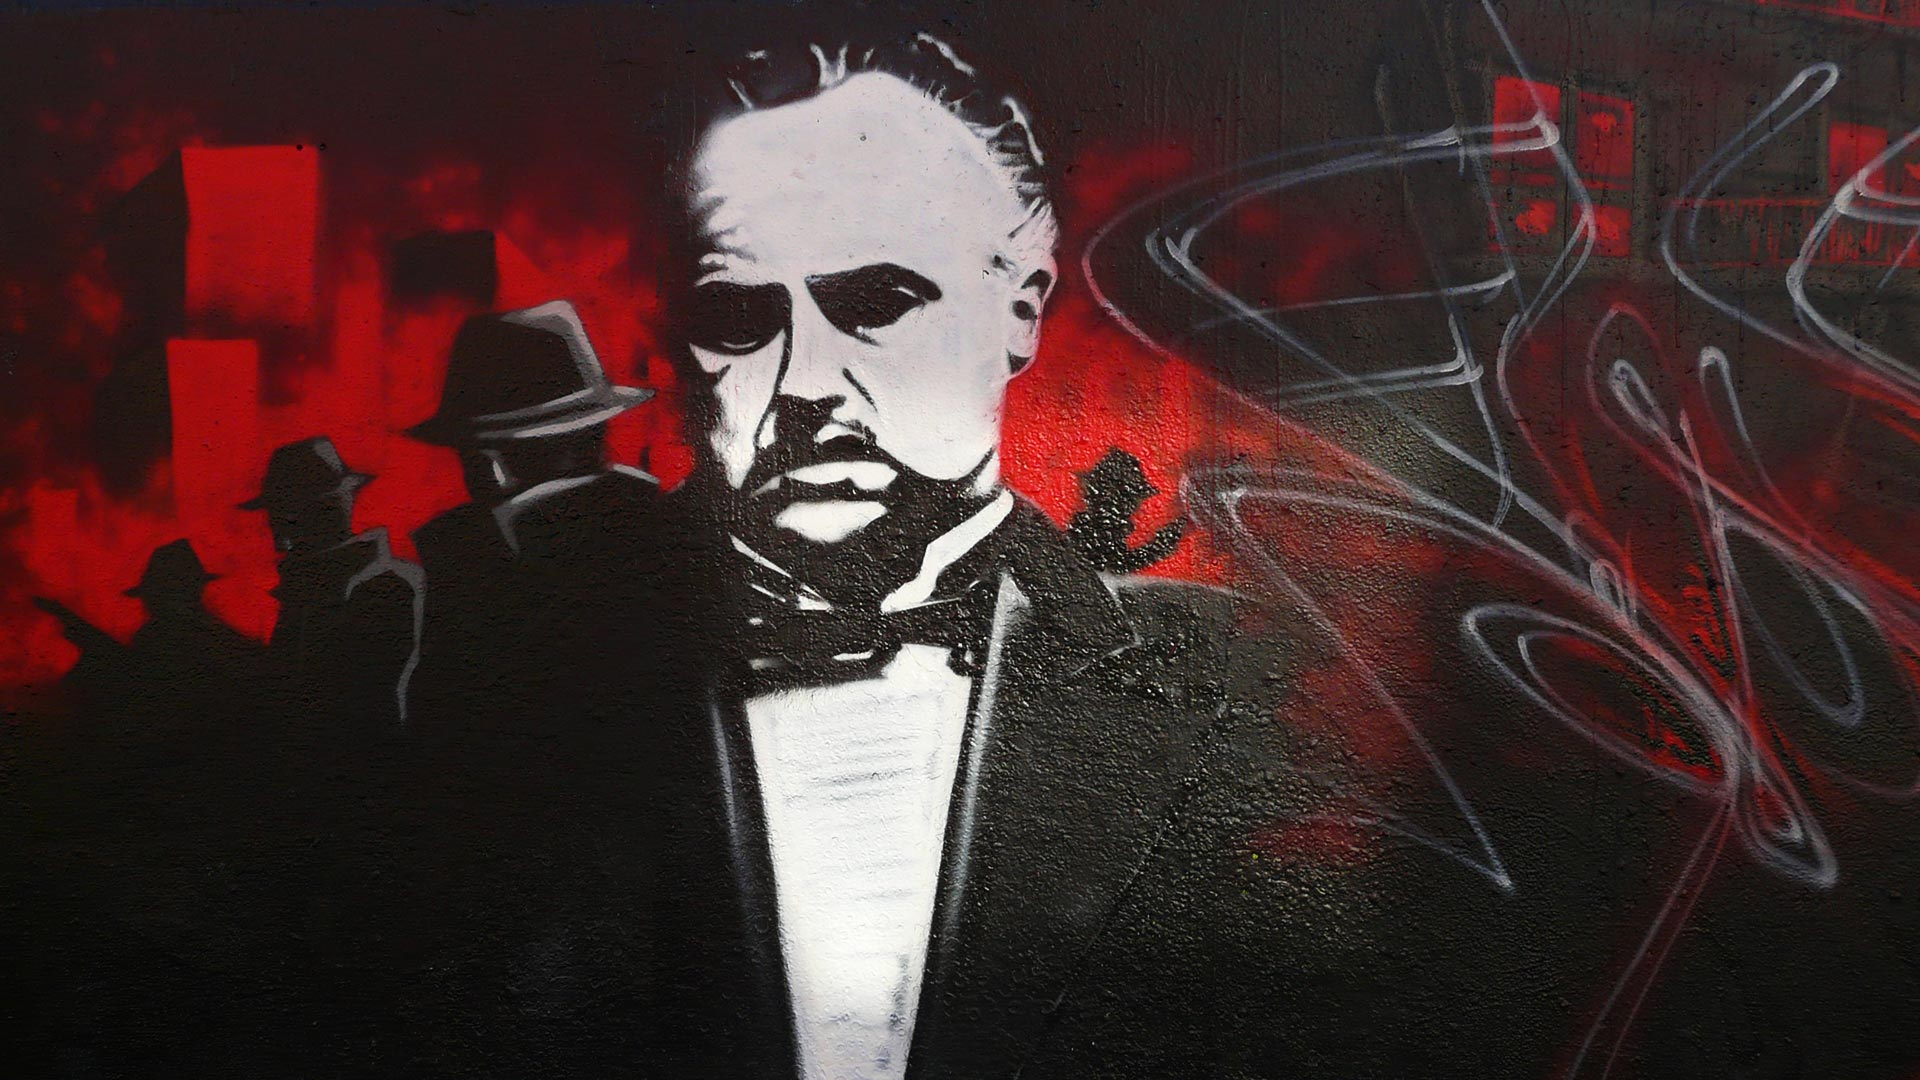 Epok - Fresque Mafiosa - Le Parrain - Graffiti